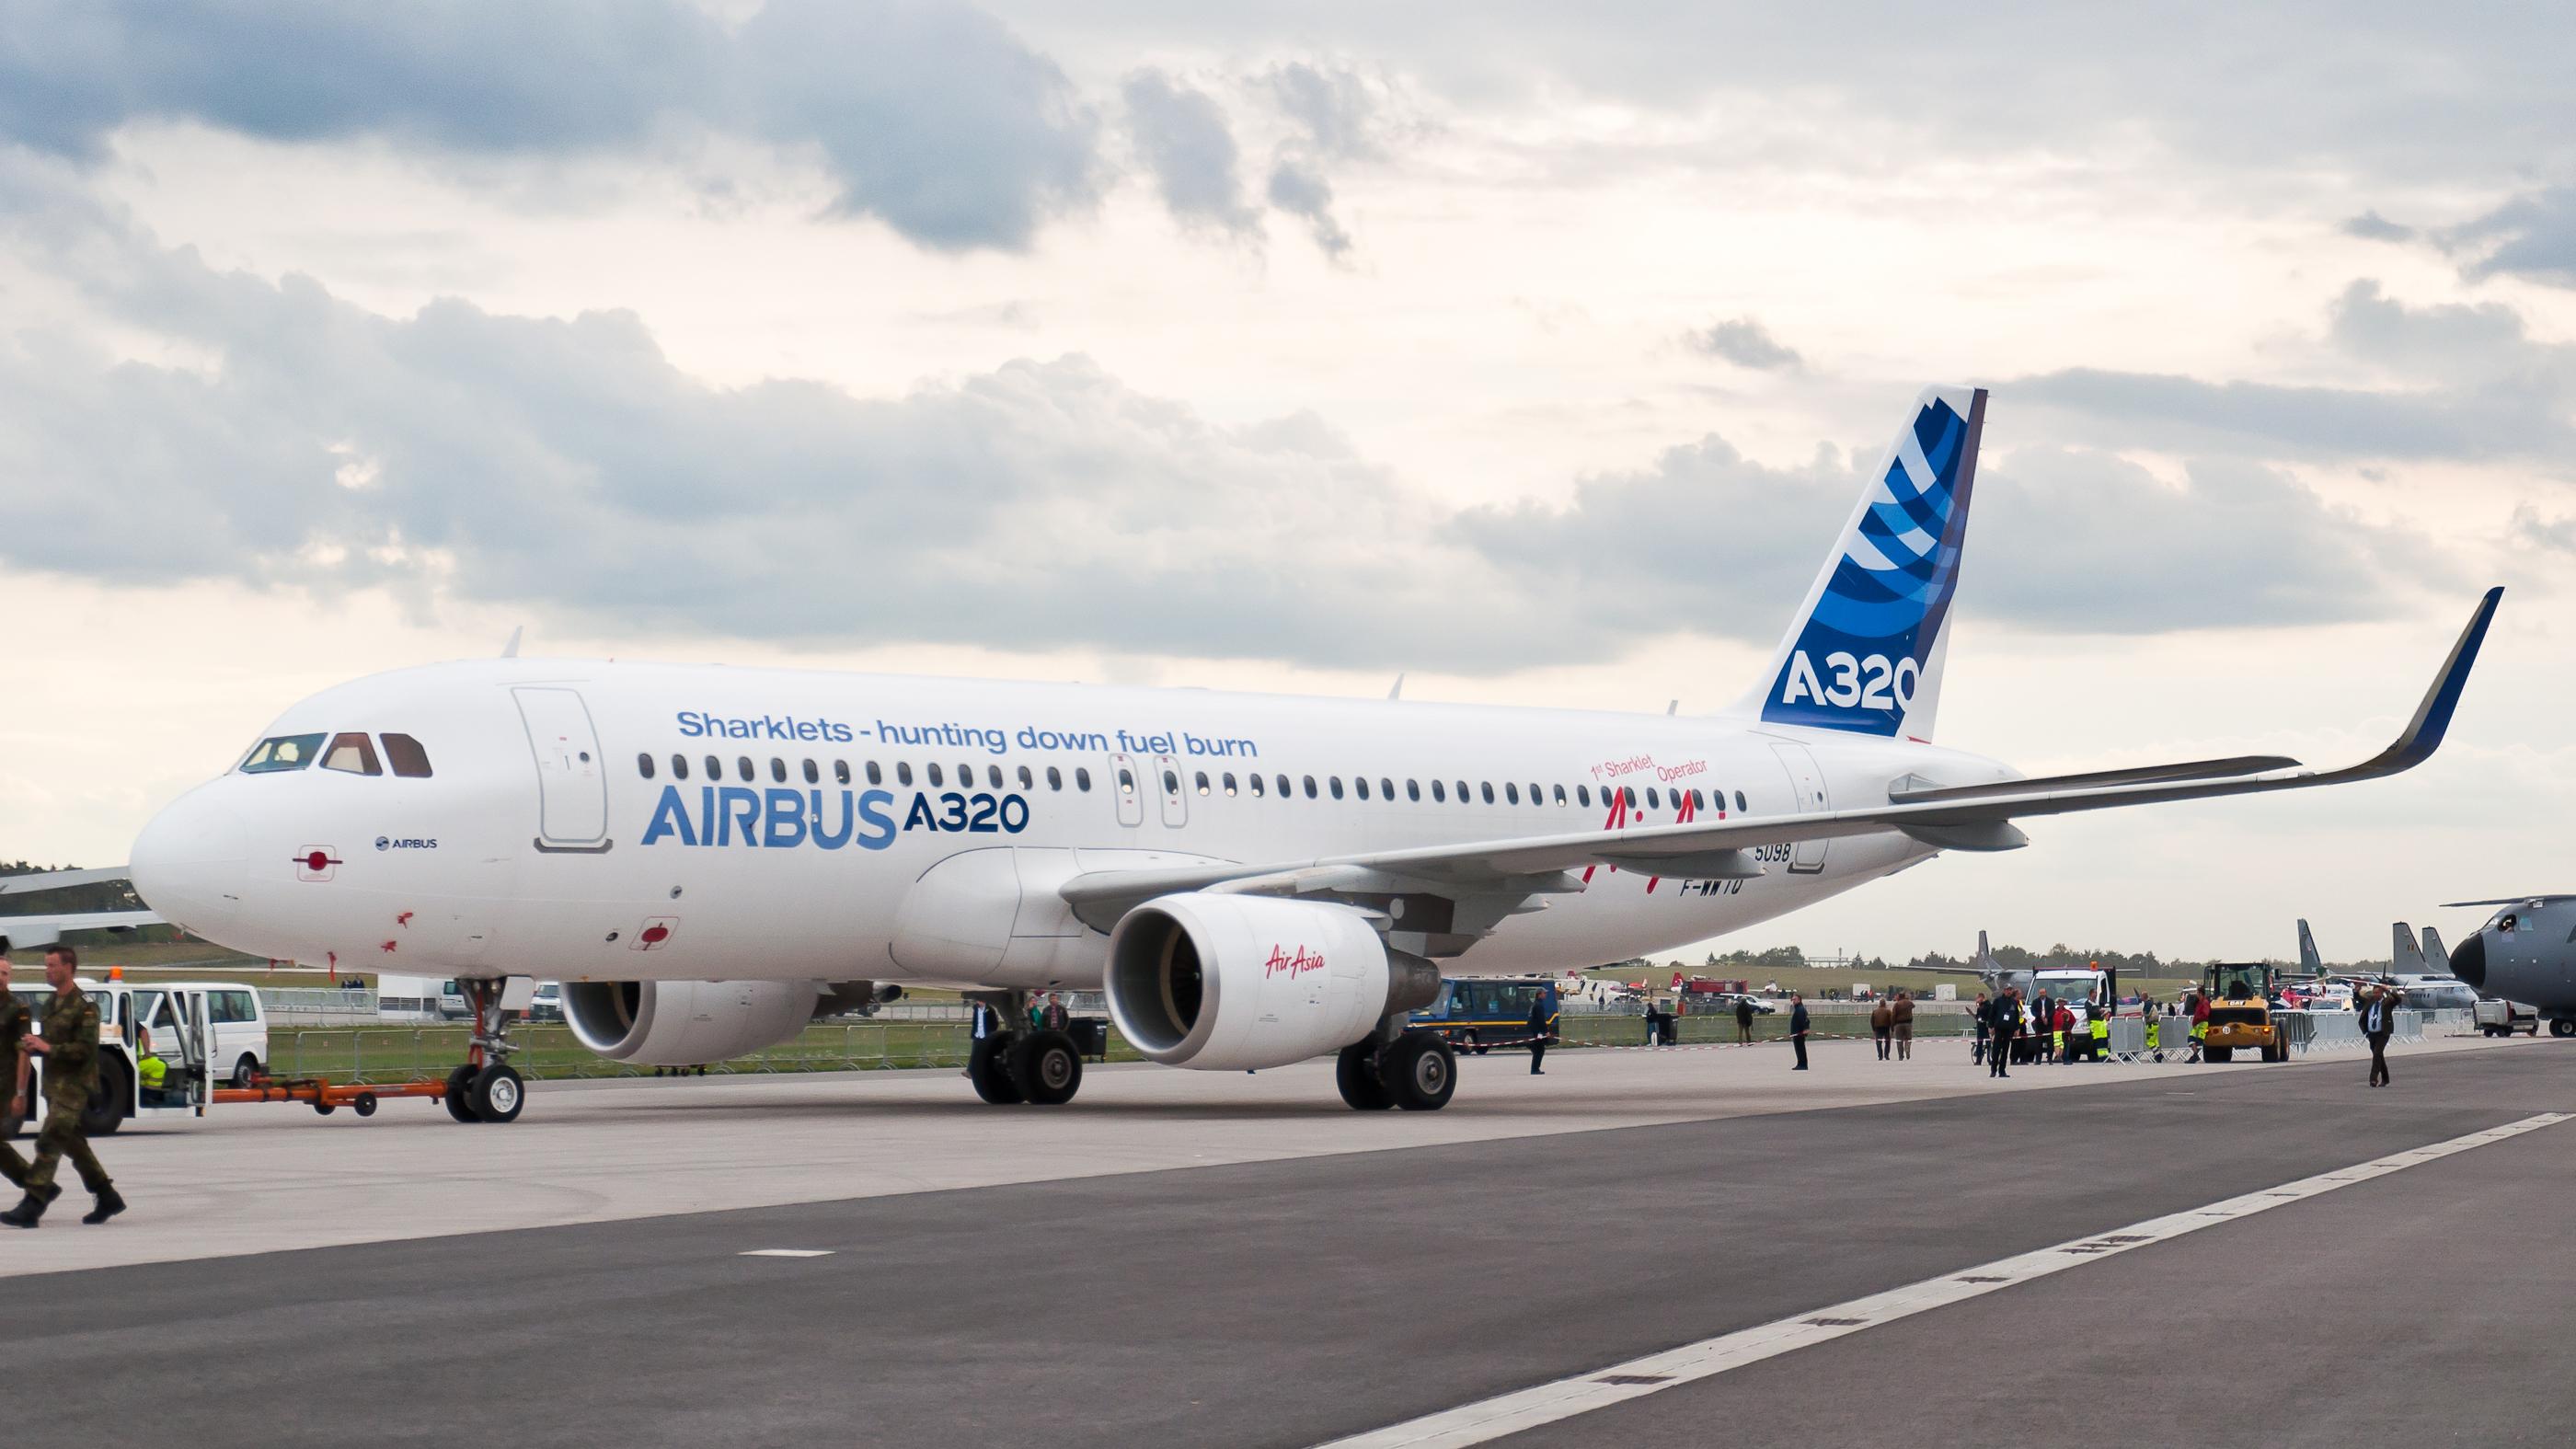 F-WWIQ_Airbus_A320_sharklet_ILA_2012_06